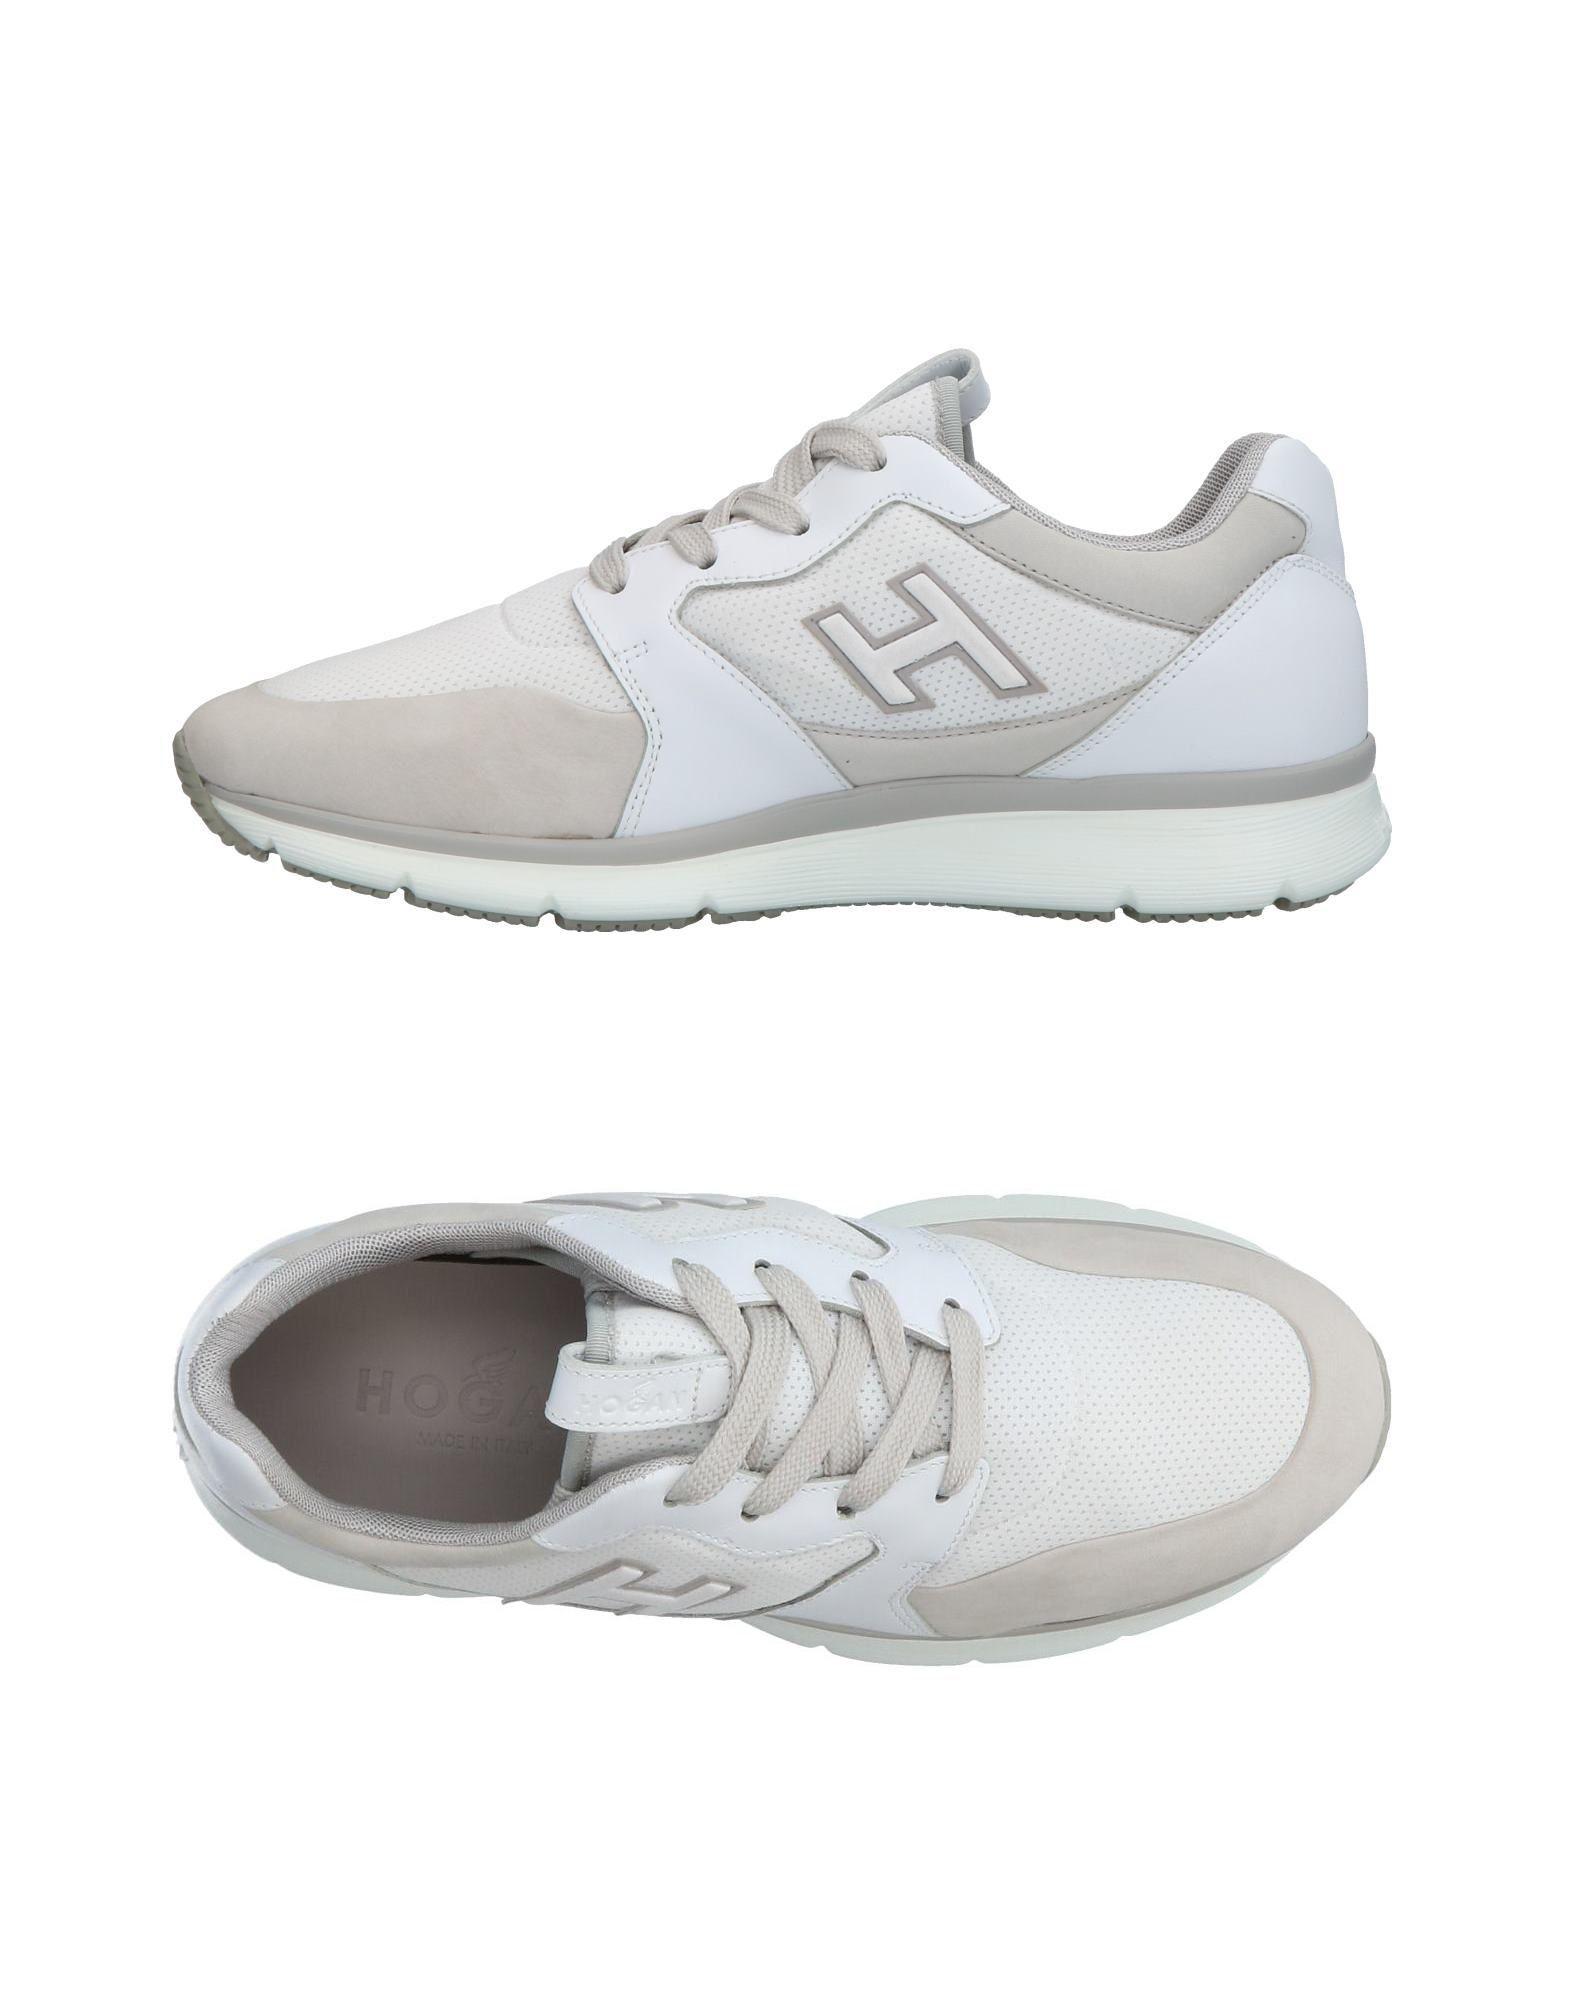 Hogan Sneakers Herren  11332347KV Gute Qualität beliebte Schuhe